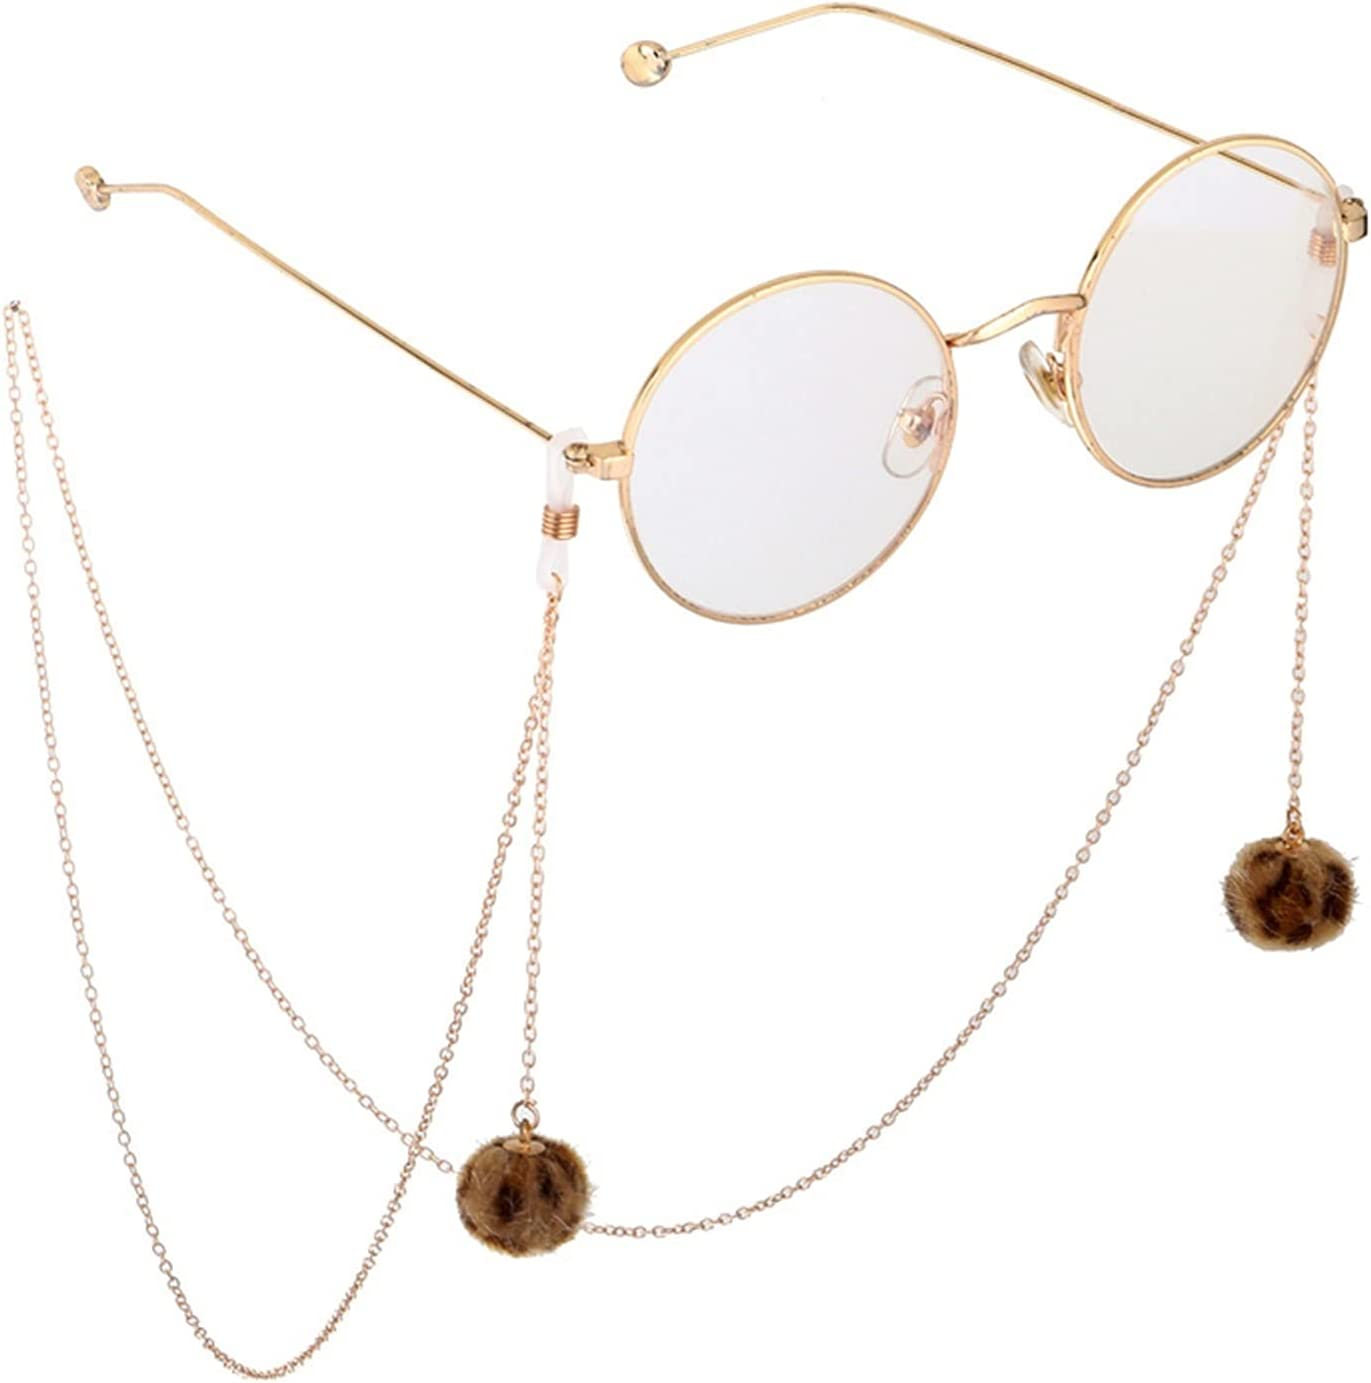 HYMD Eyeglass Chain Fashion Ladies Plush Pendant 85 cm Sunglasses Eyeglass Chain Accessories Anti-Lost Chain (Color : 20210656 1)